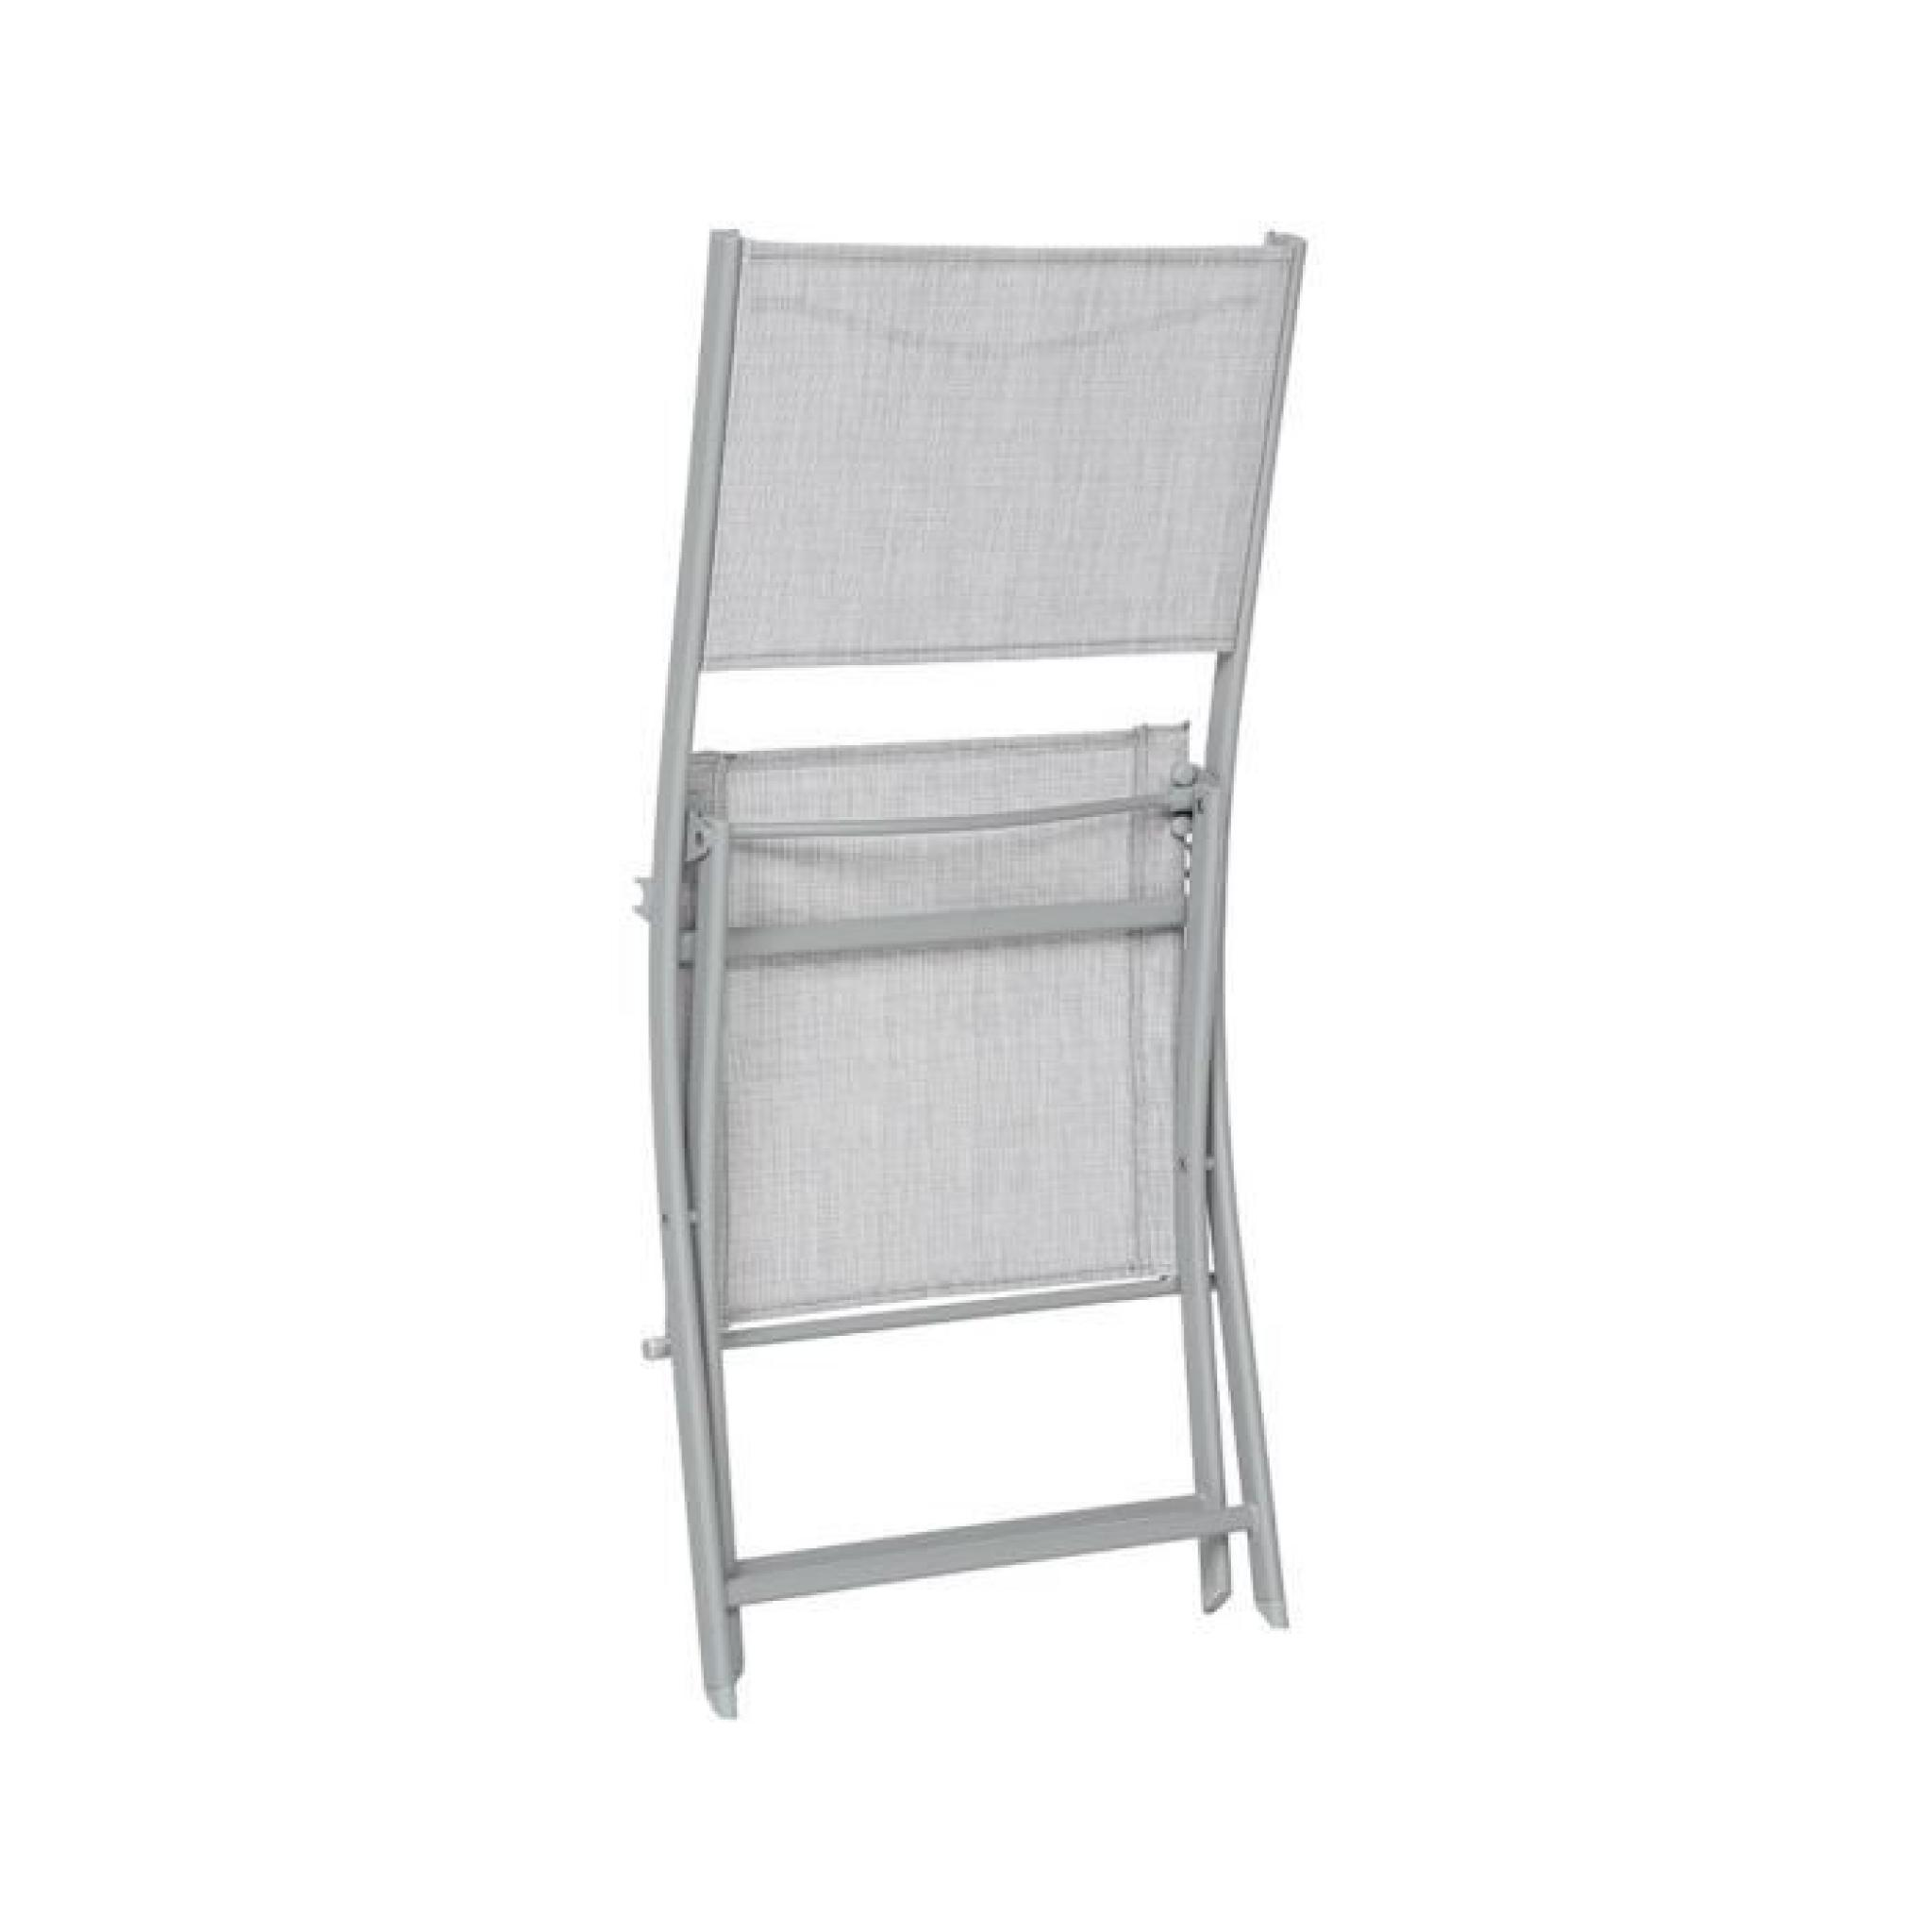 chaise pliante hesp ride modula galet chin silver mat achat vente chaise de jardin pliante. Black Bedroom Furniture Sets. Home Design Ideas